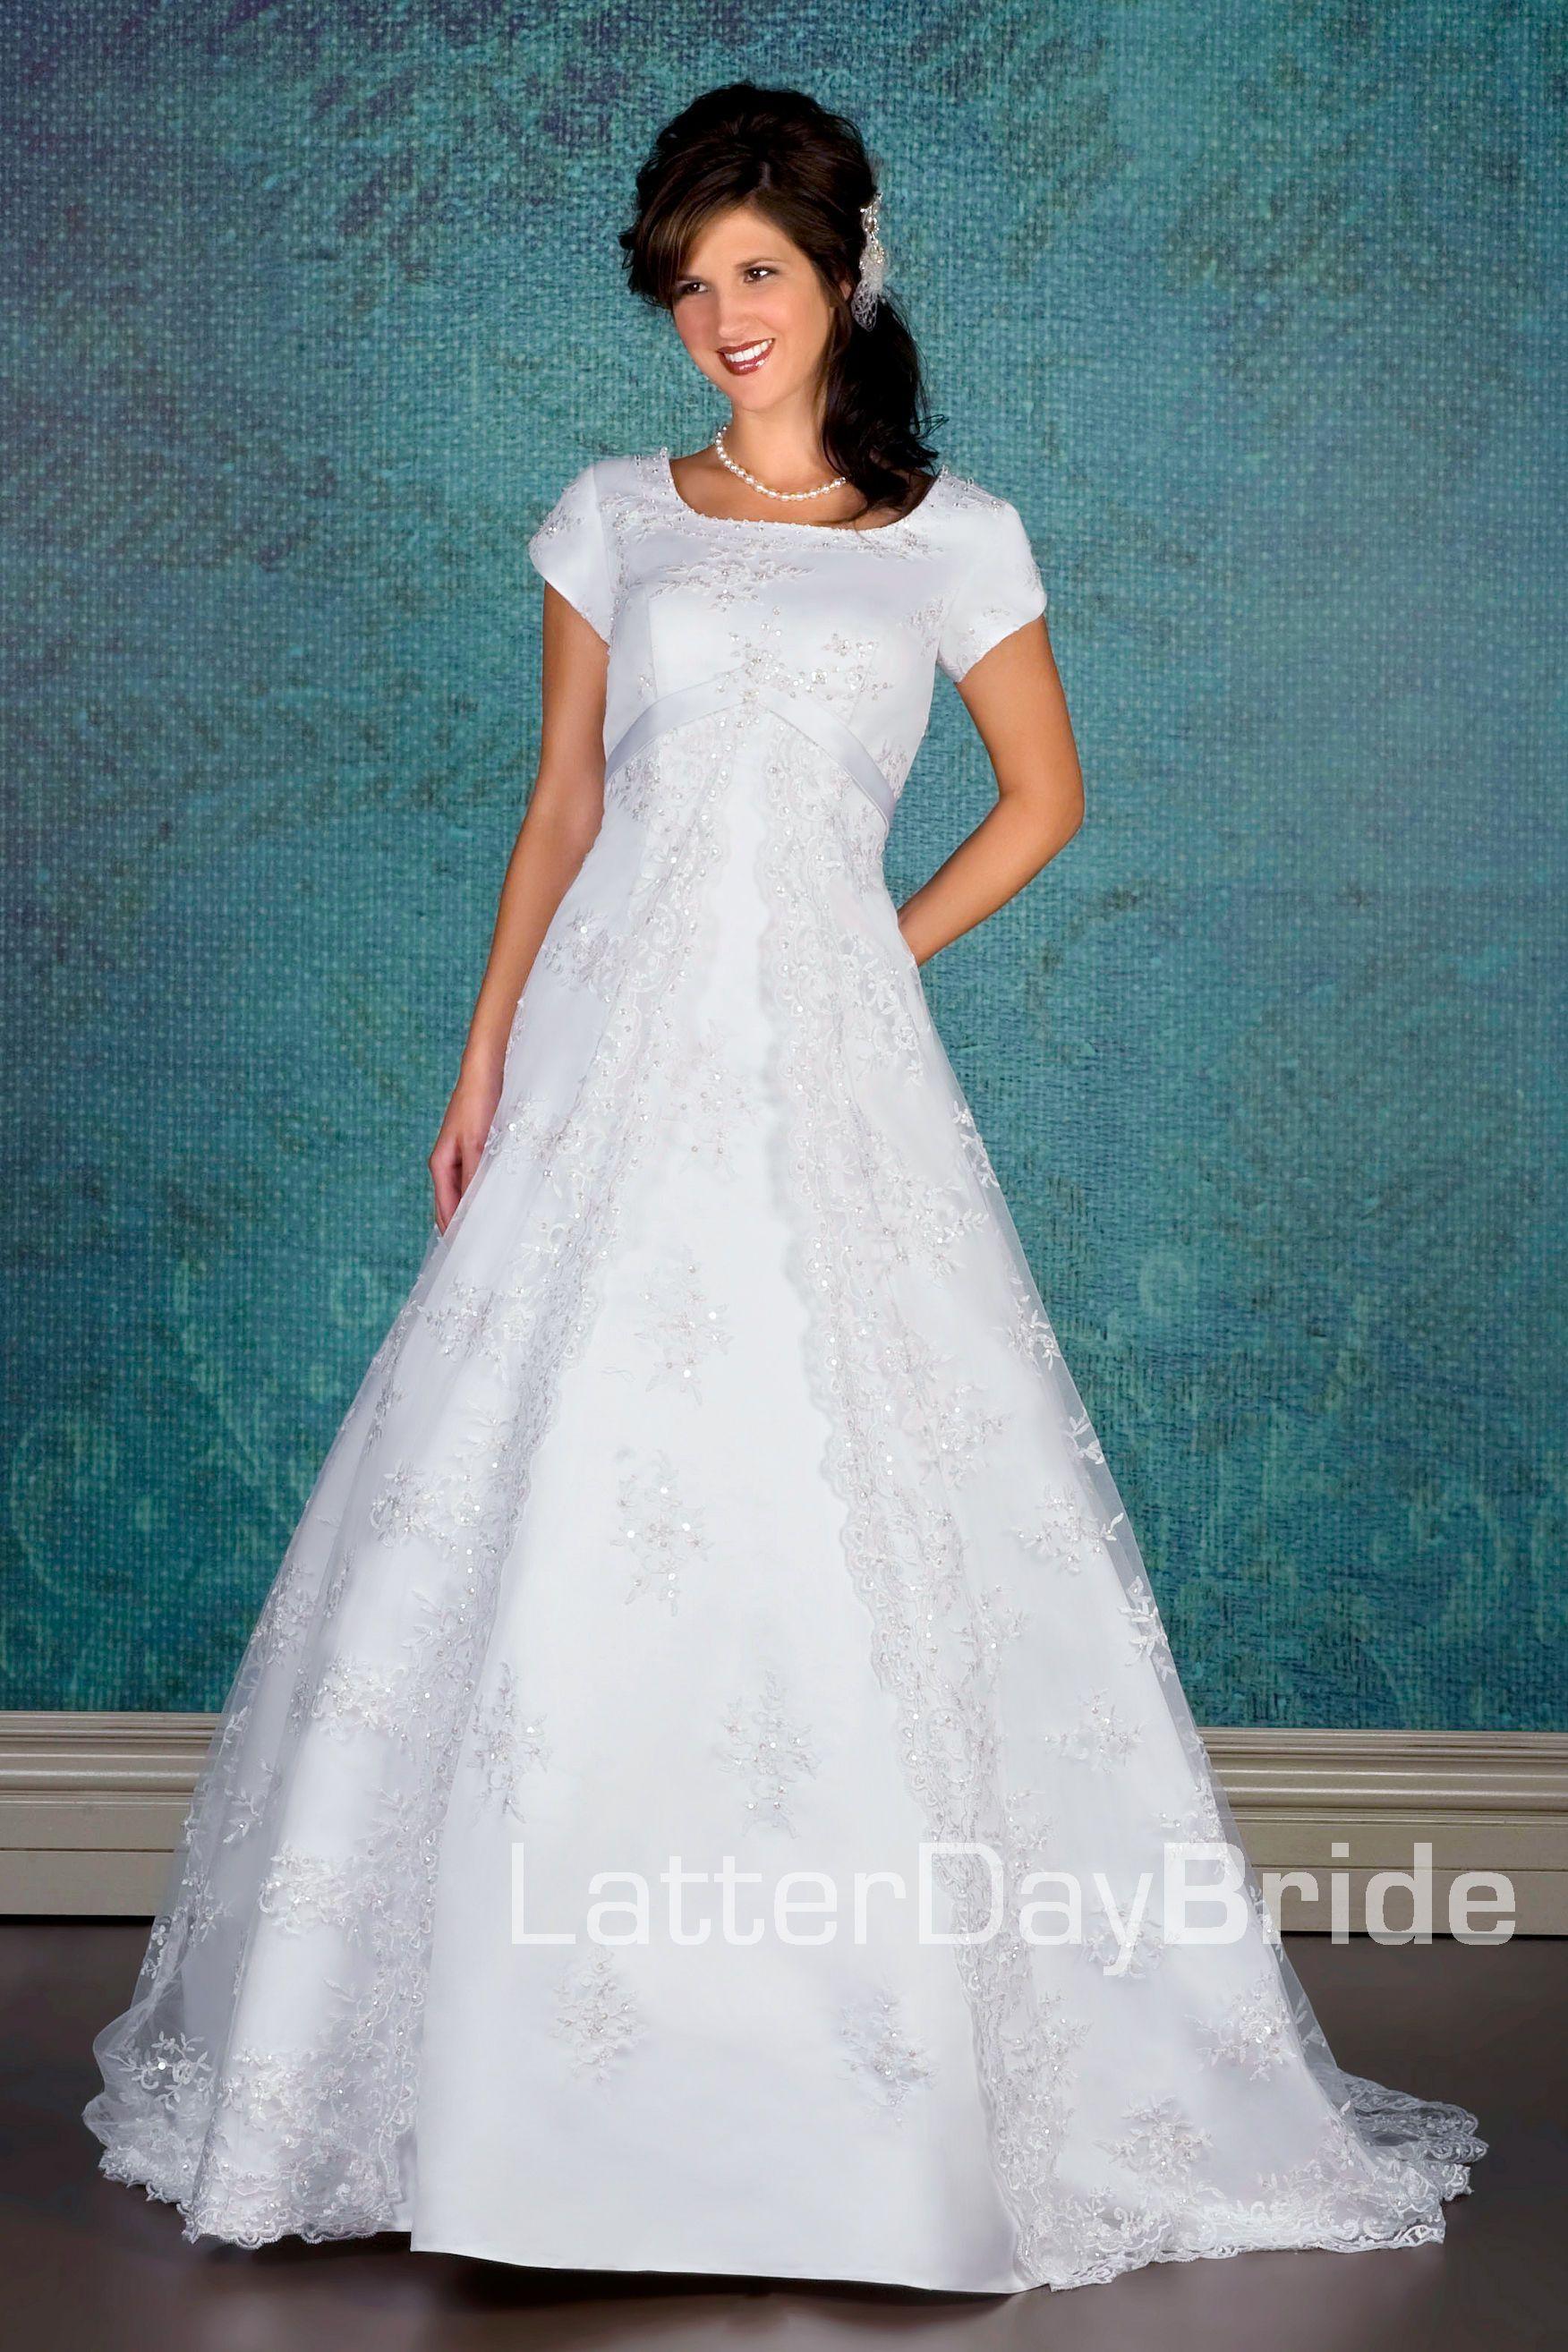 Stunning August Wedding Dresses Gallery - Wedding Ideas - memiocall.com